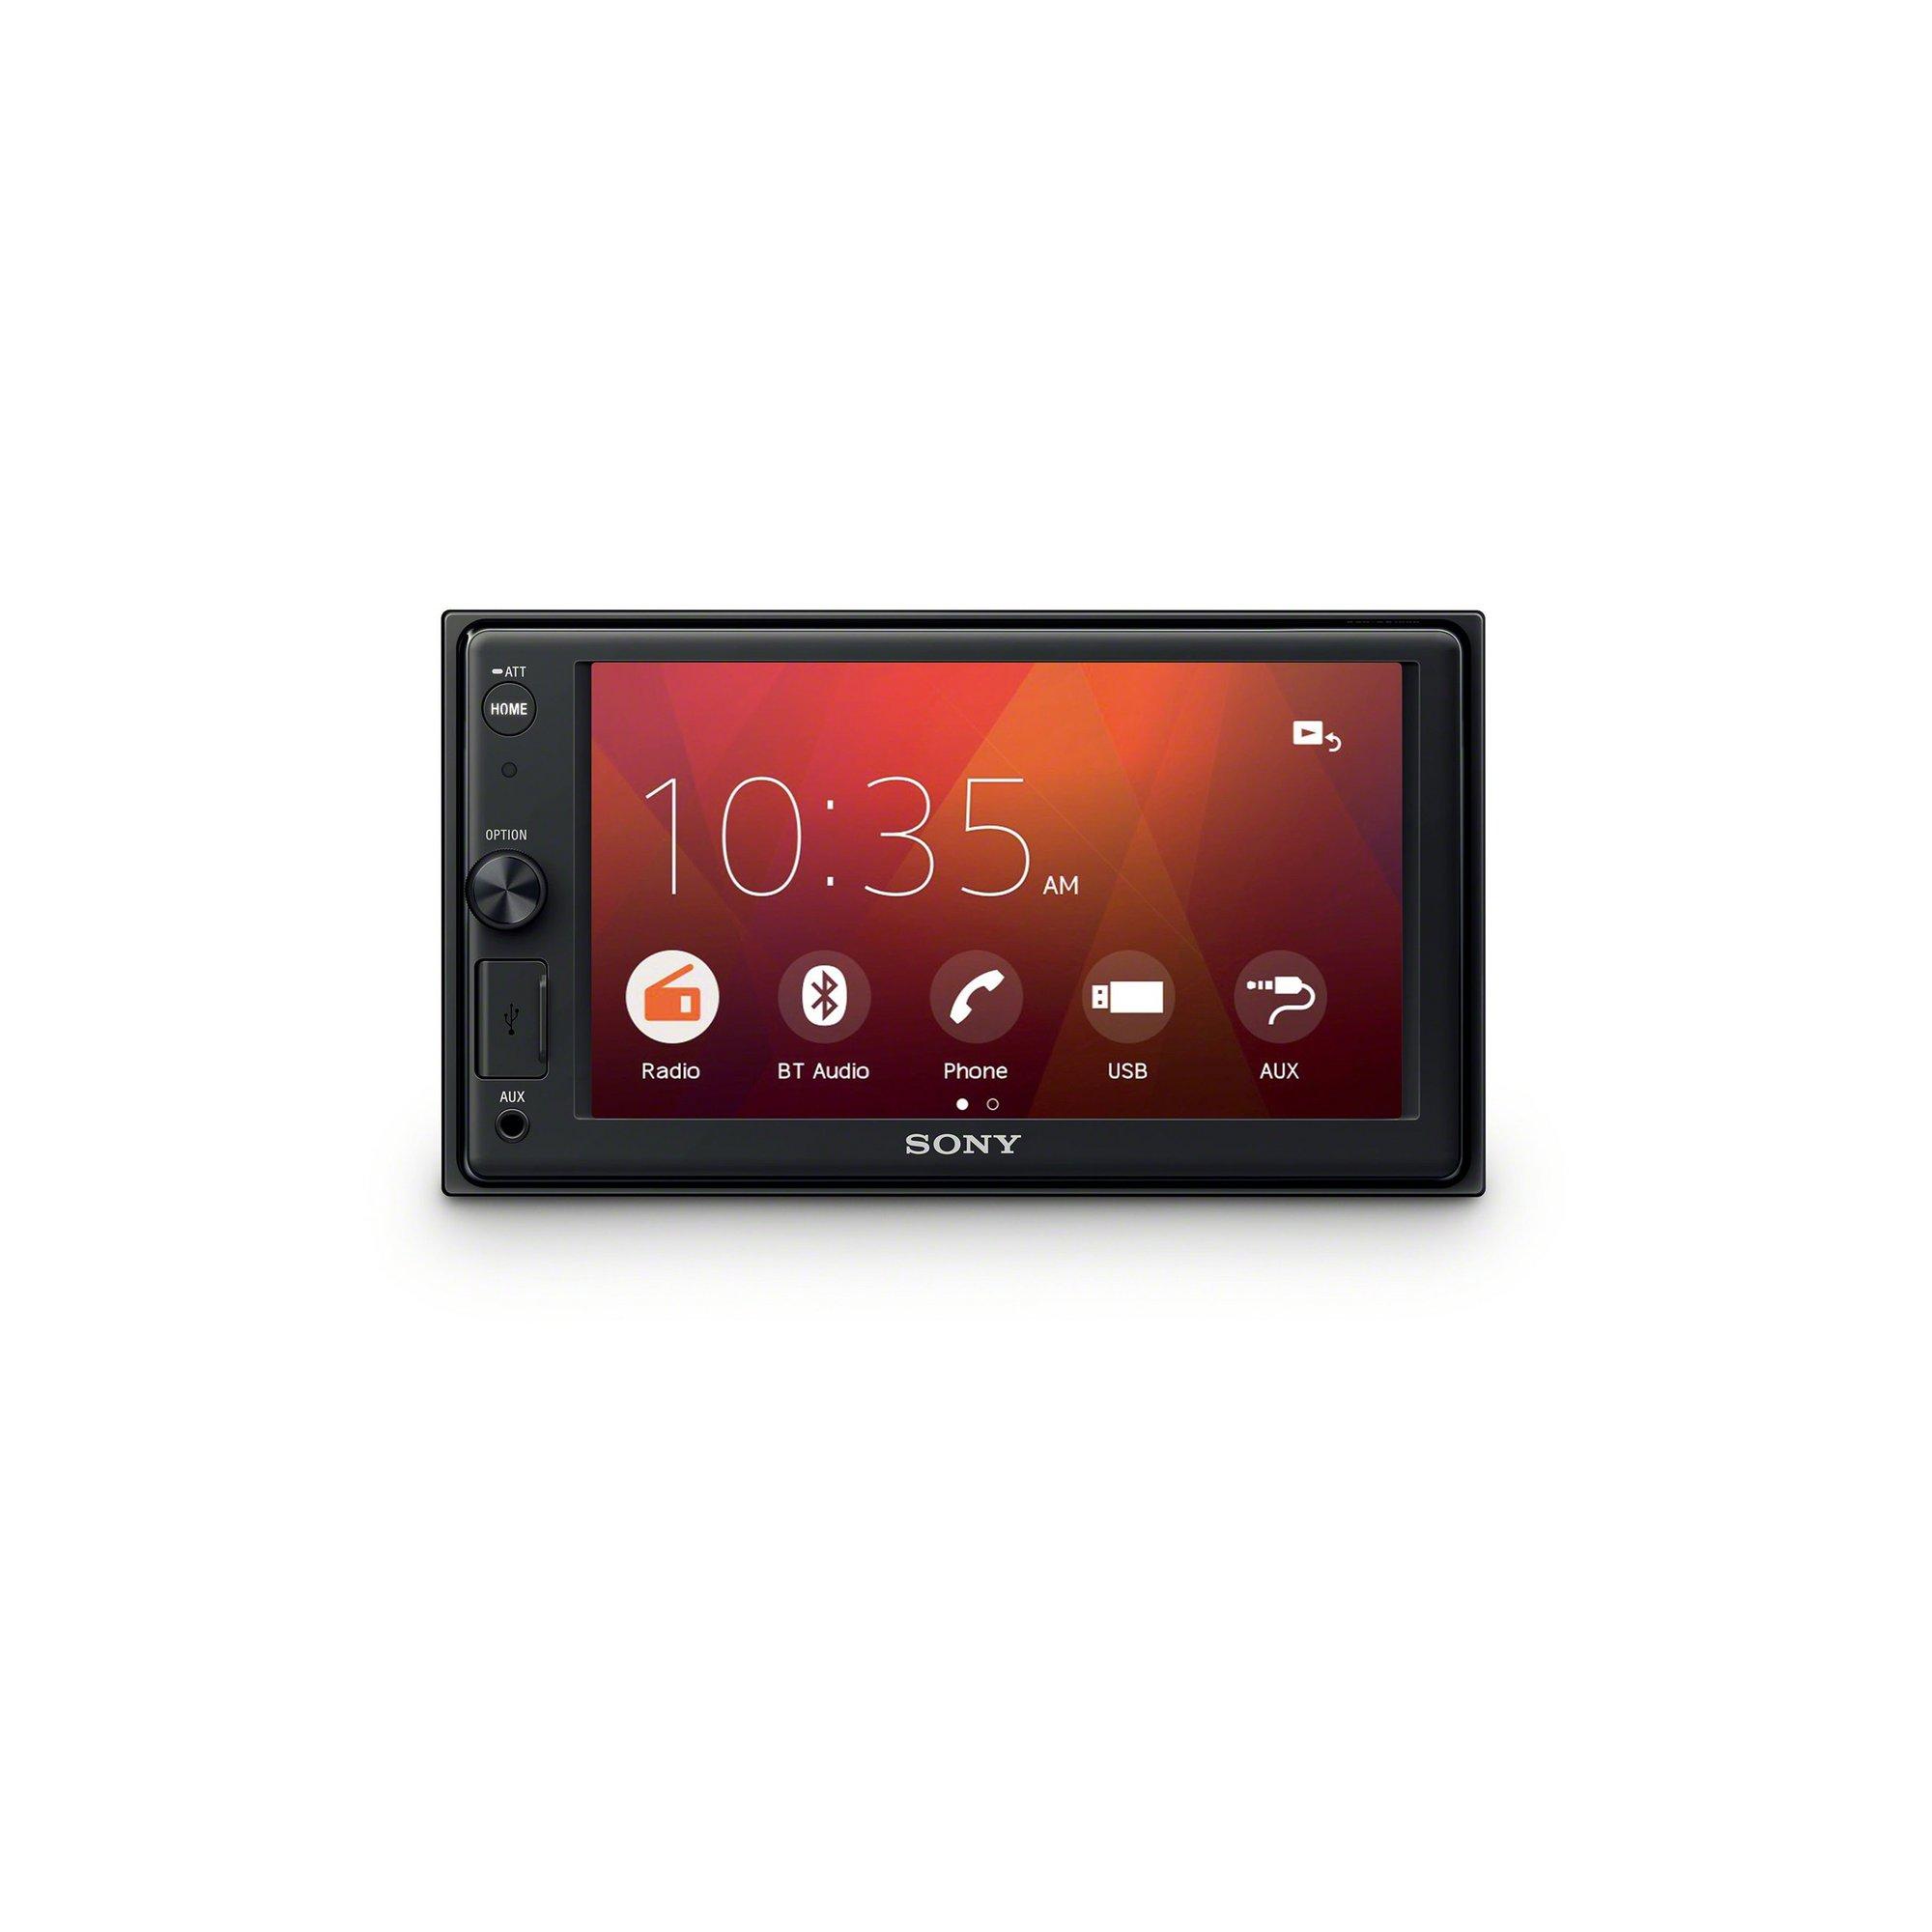 Image of Sony XAV-1550D Smart Bluetooth with DAB Car Radio